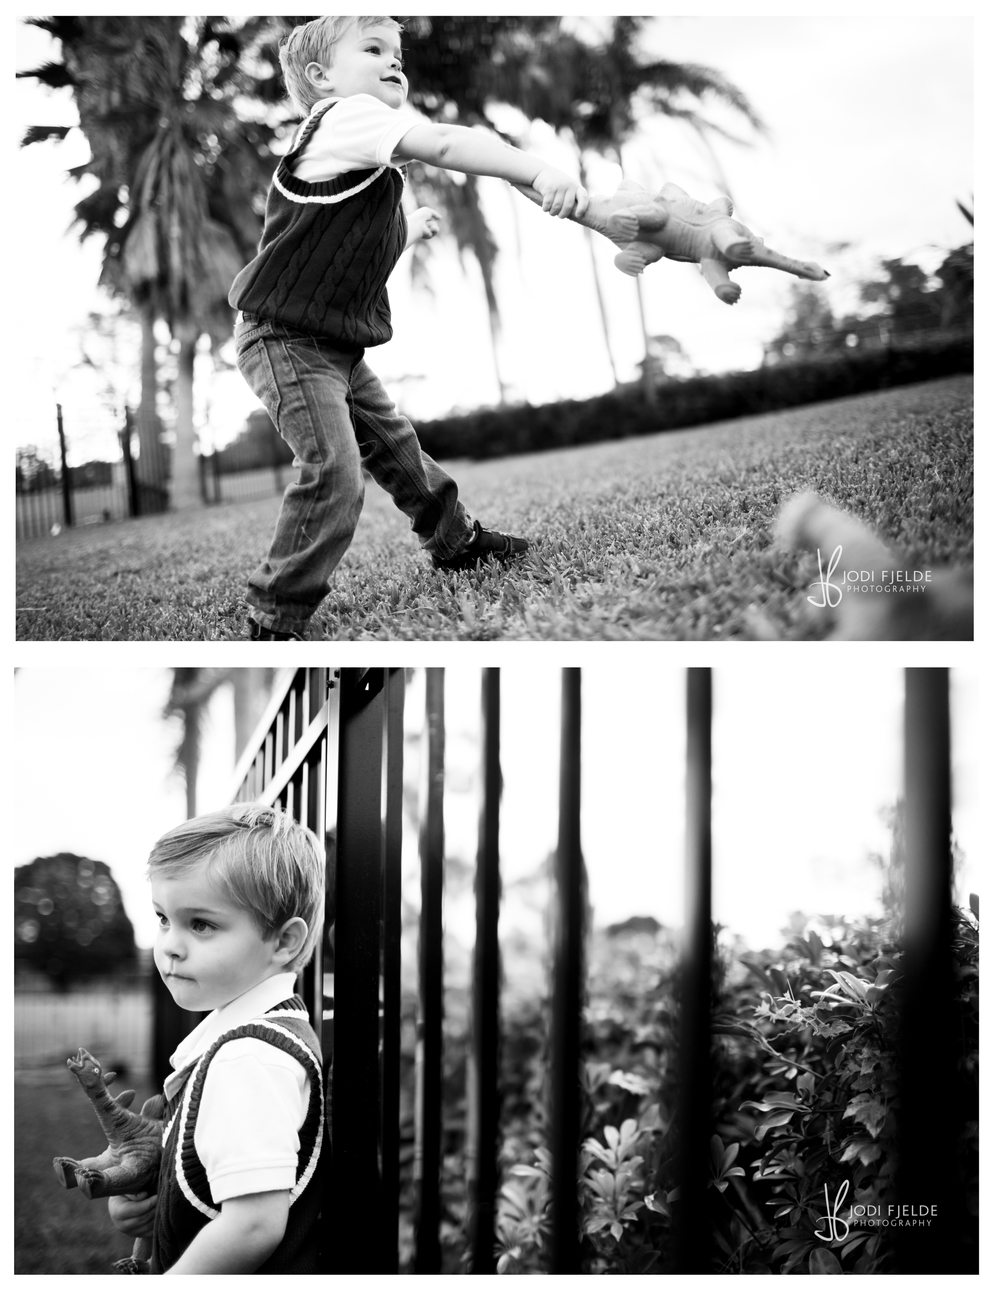 Boynton_Beach_Child_Photographer_Brady_Jodi_Fjelde_Photography 9.jpg